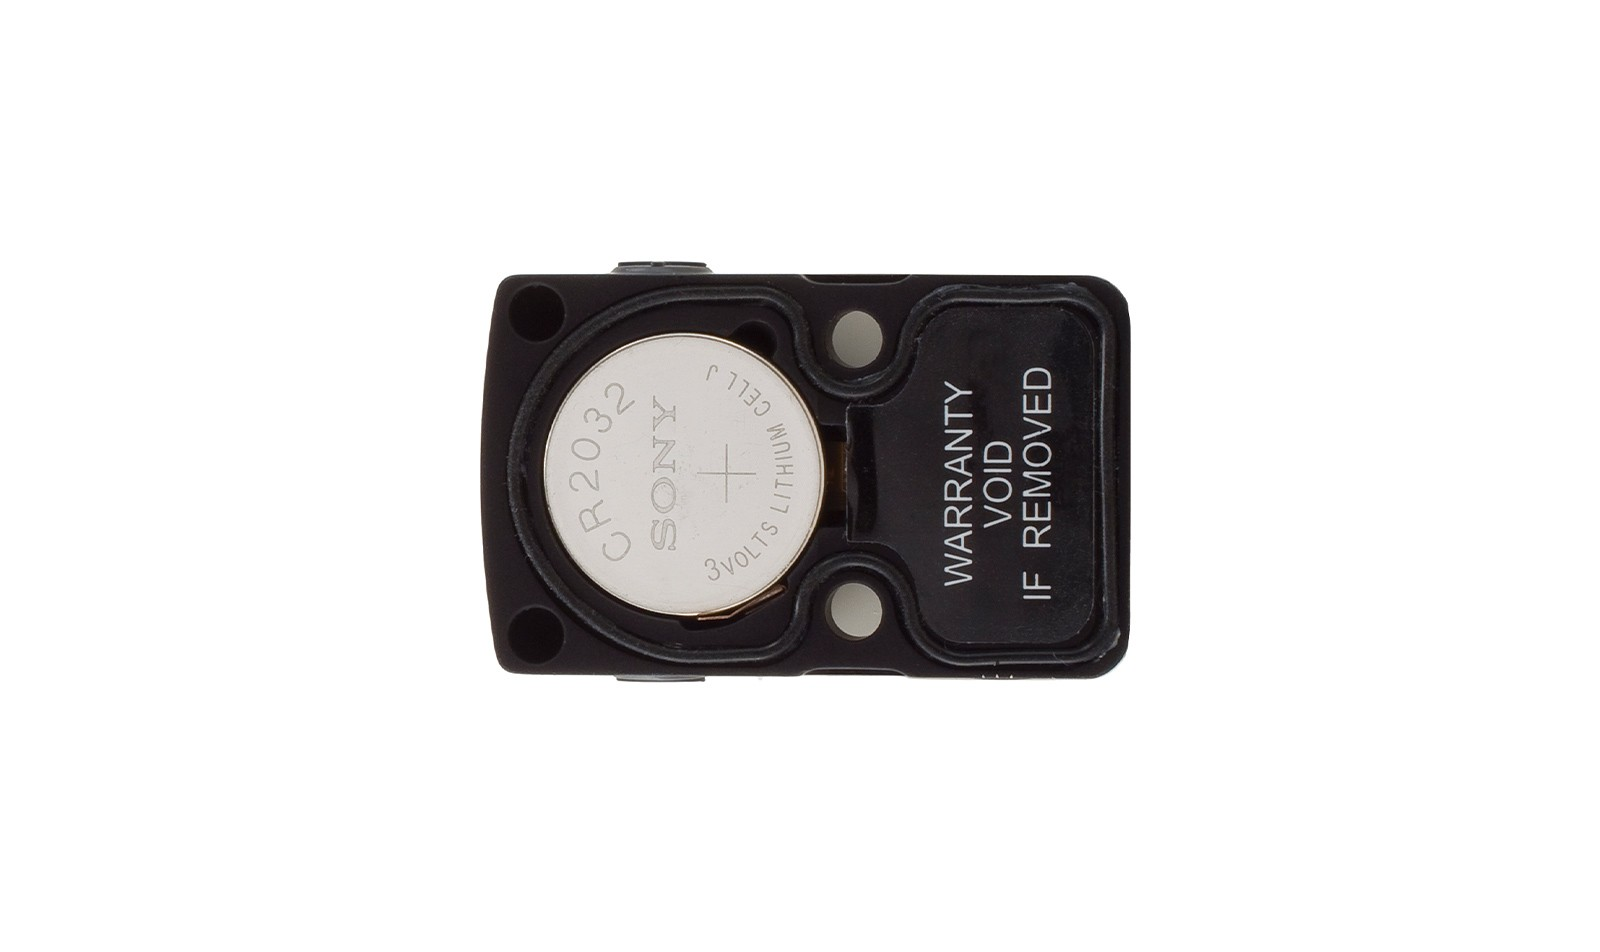 Trijicon RMR Typ 2 Adjustable Red Dot Sight 3.25 MOA Bild 08